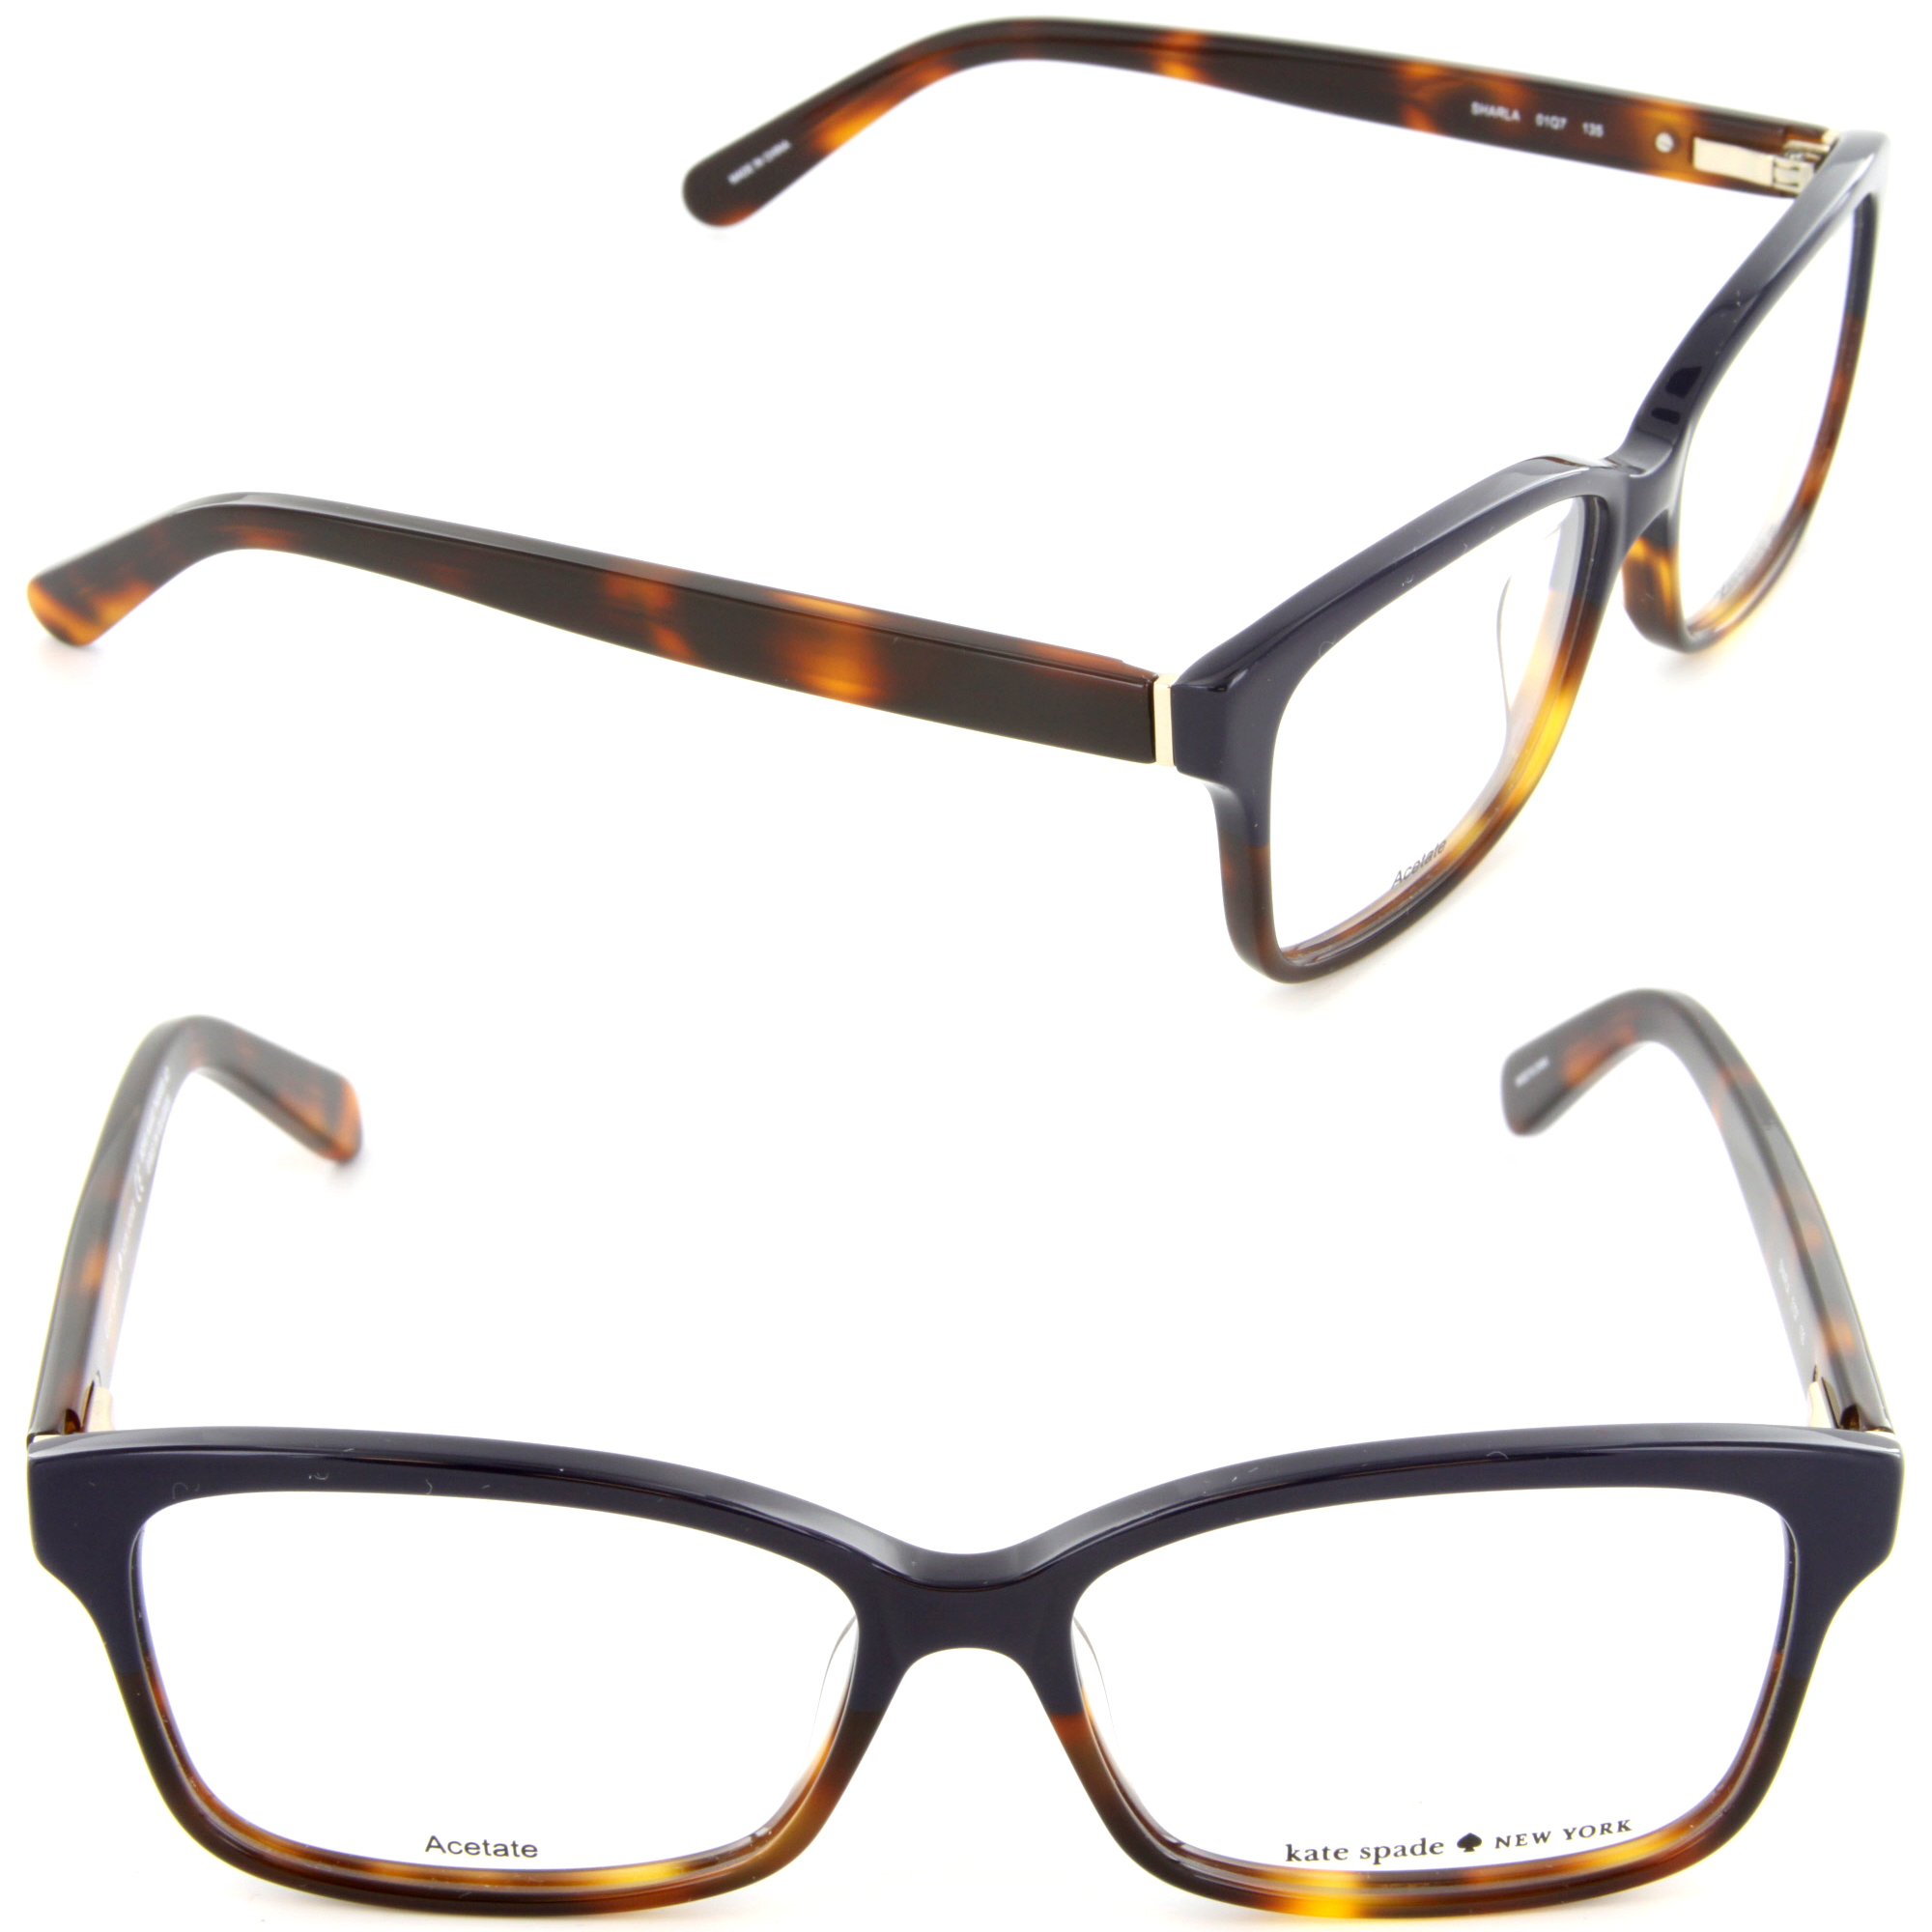 ec8b6421a31 Eyeglasses Kate Spade Sharla 01Q7 Blue Tortoise Fade - Walmart.com